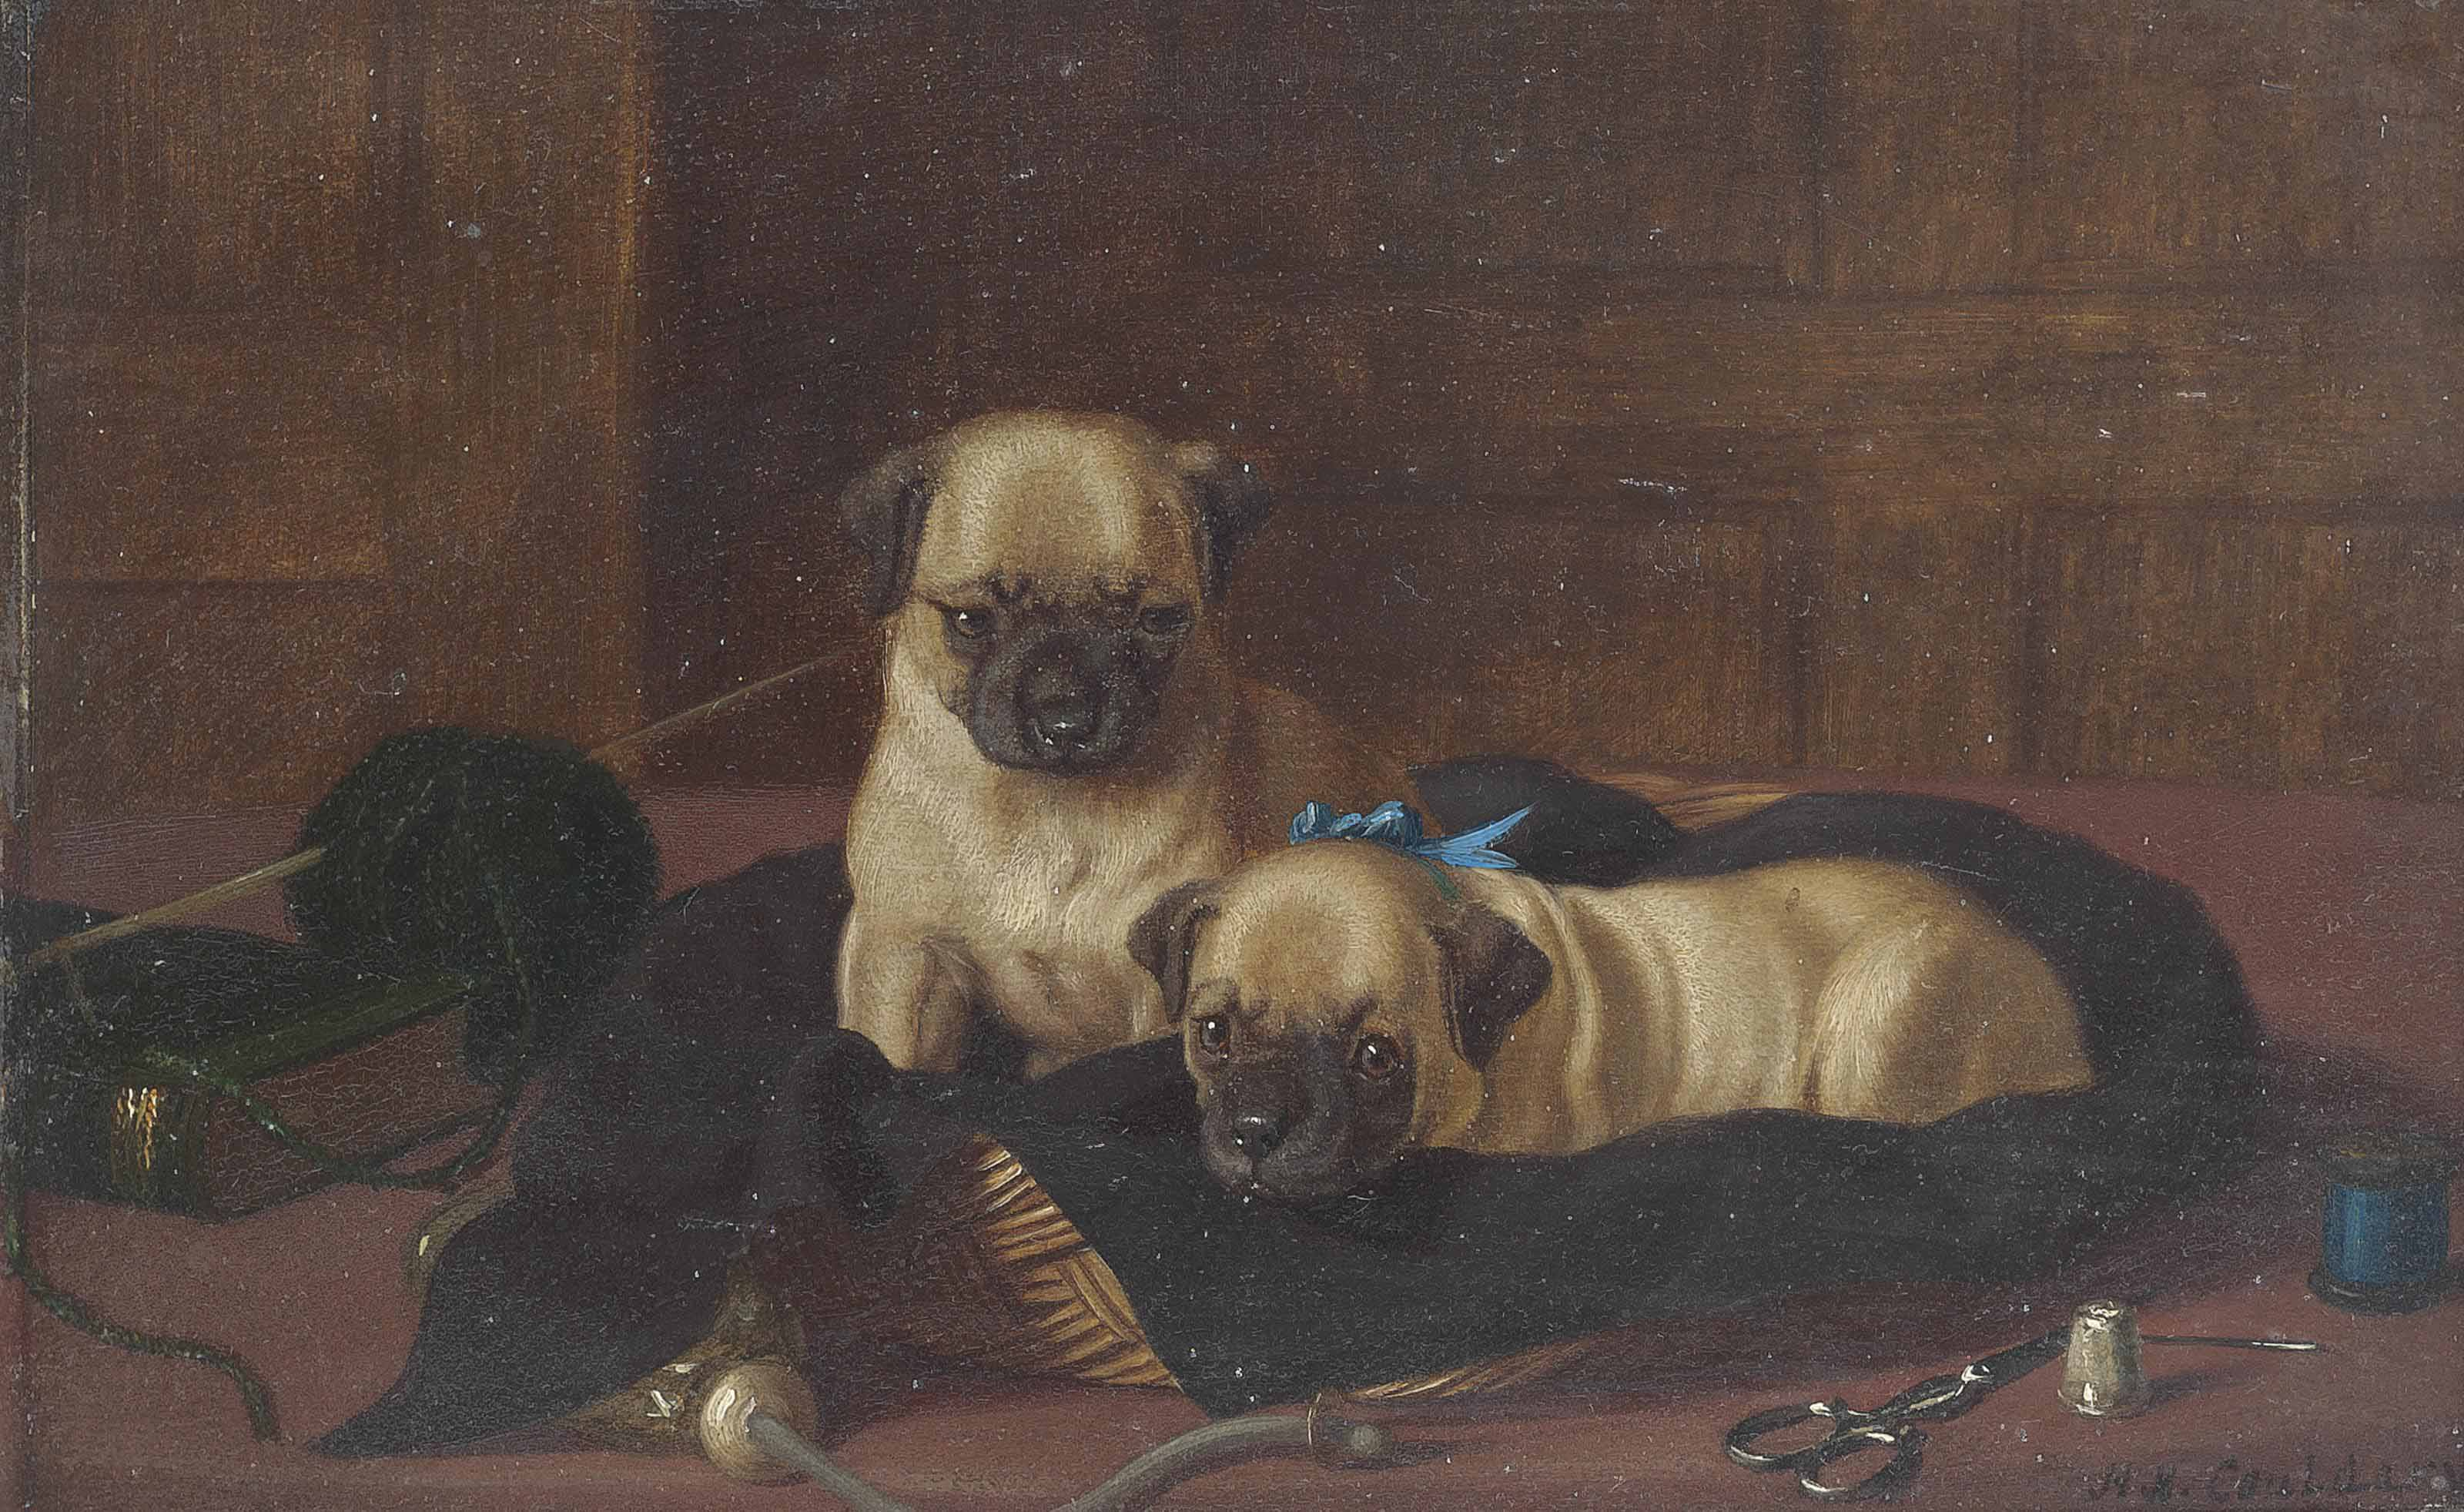 The seamstresses' pugs